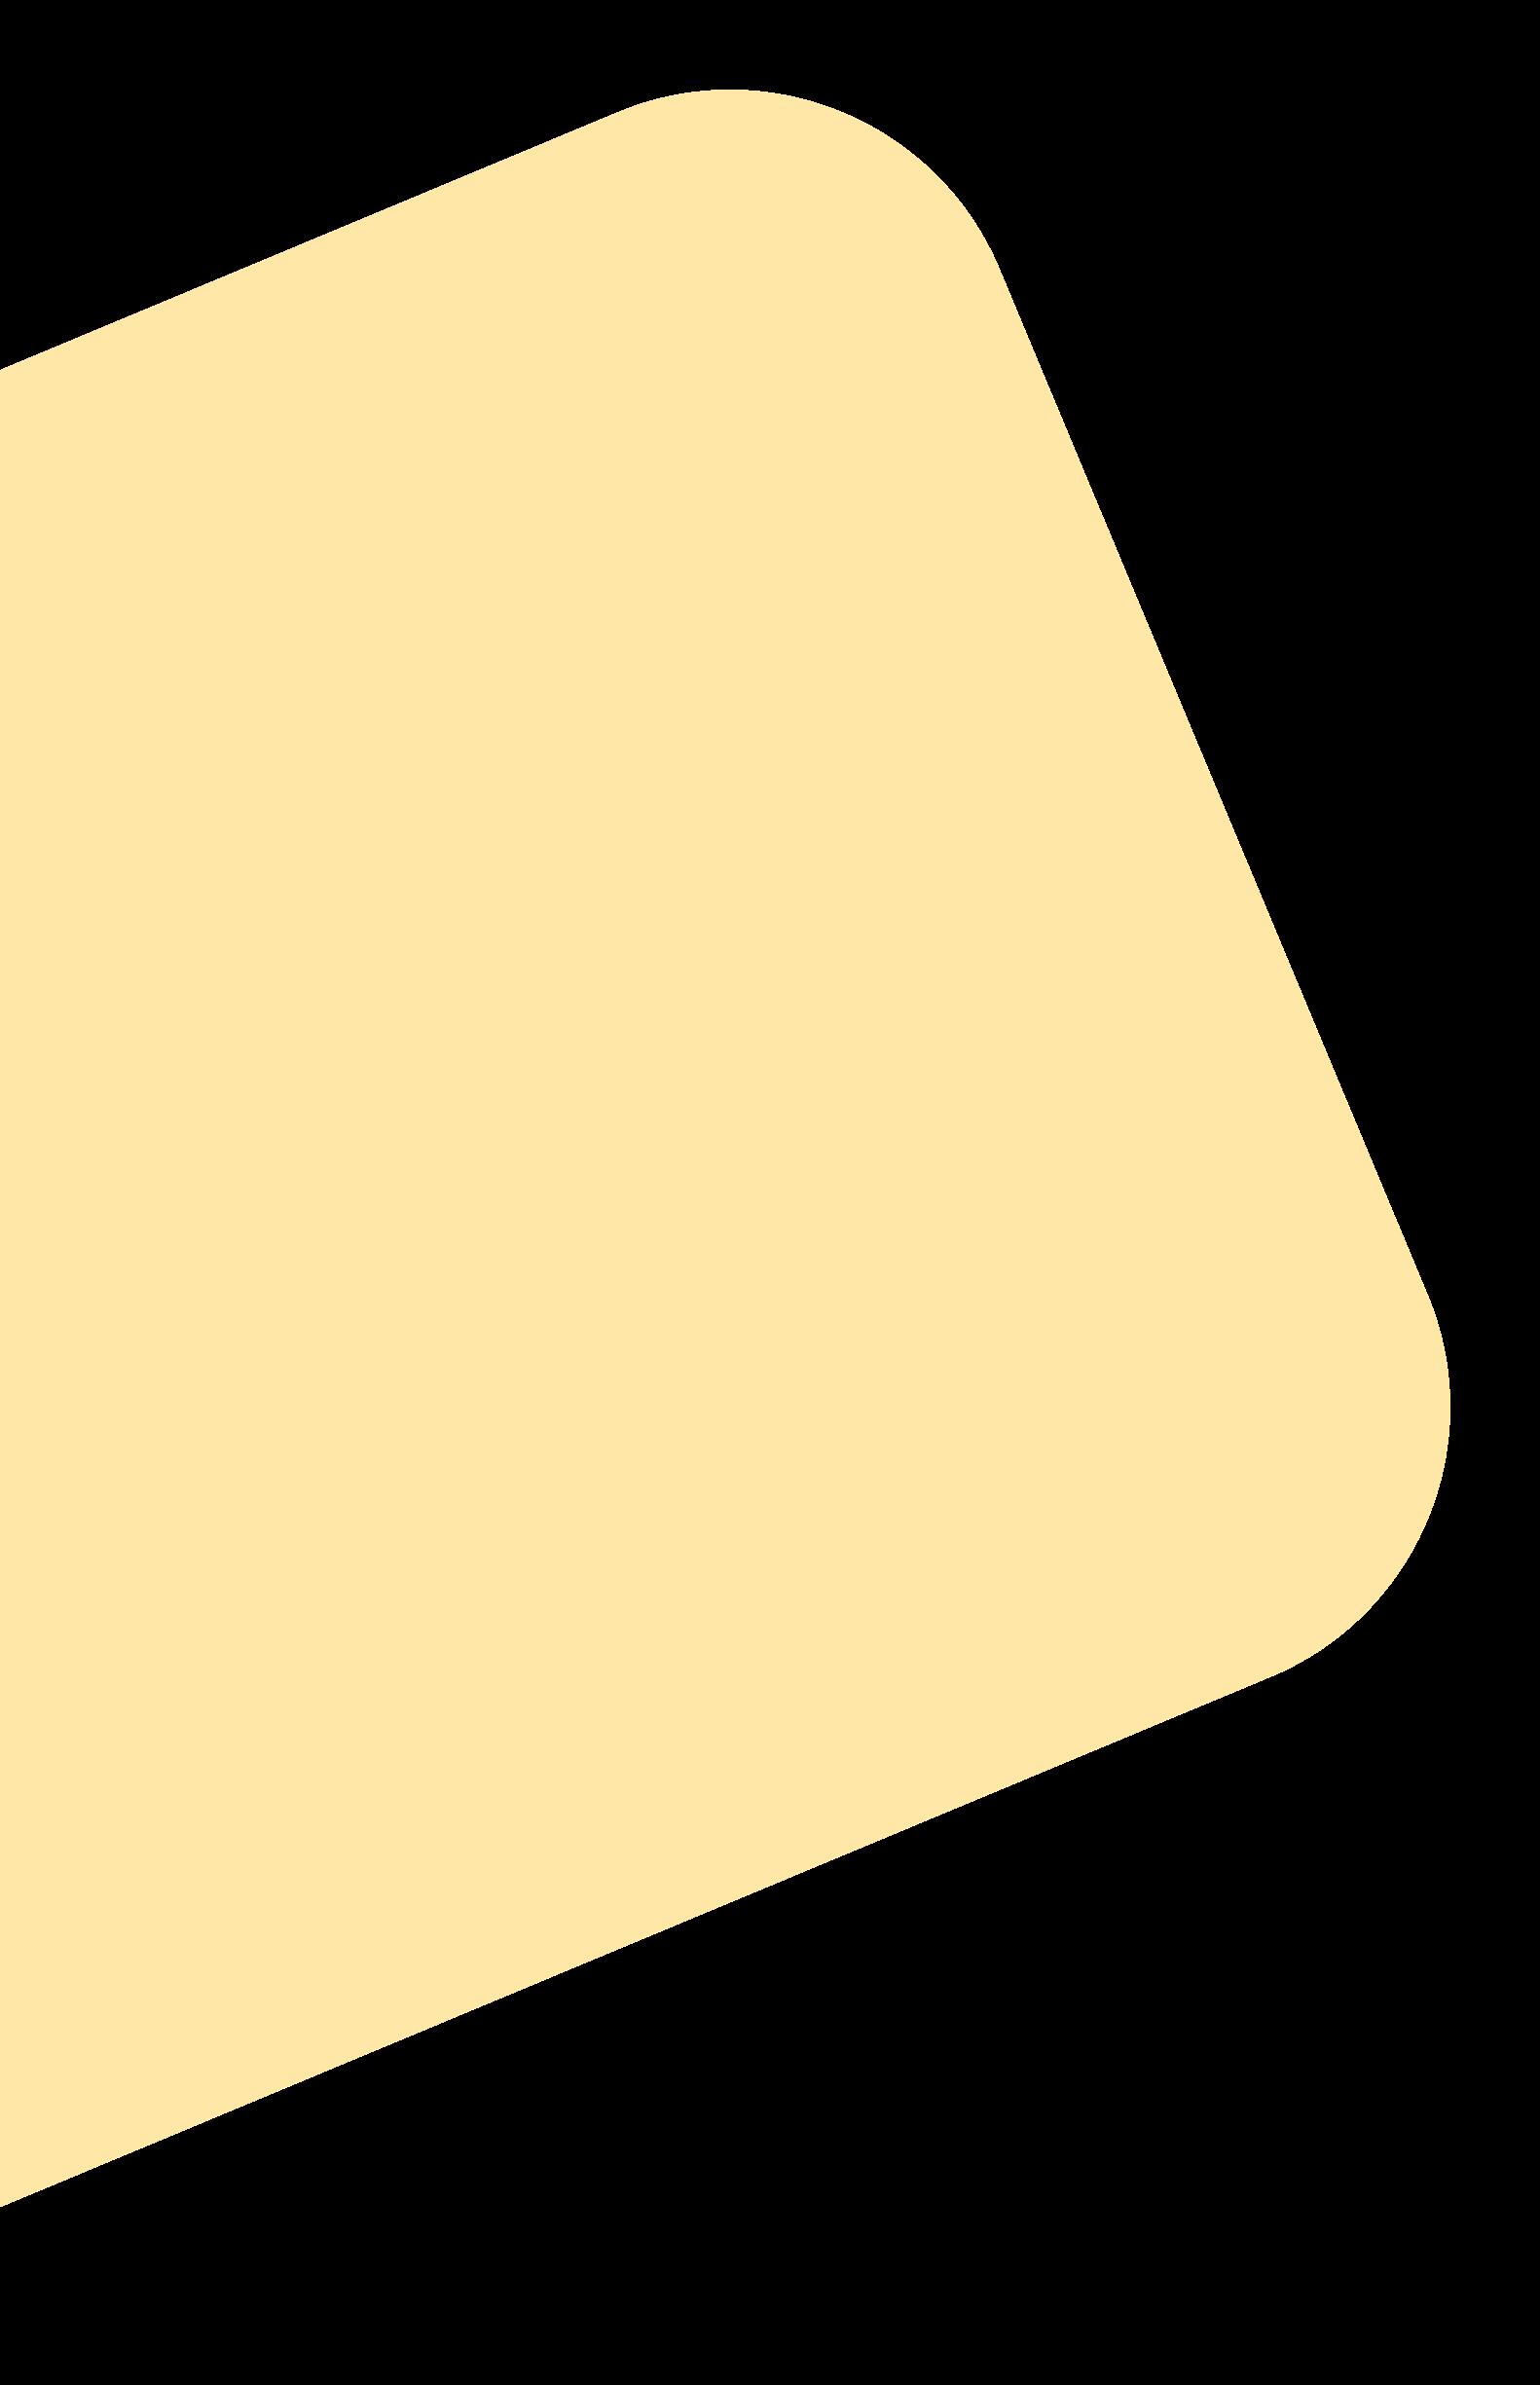 rectangle light